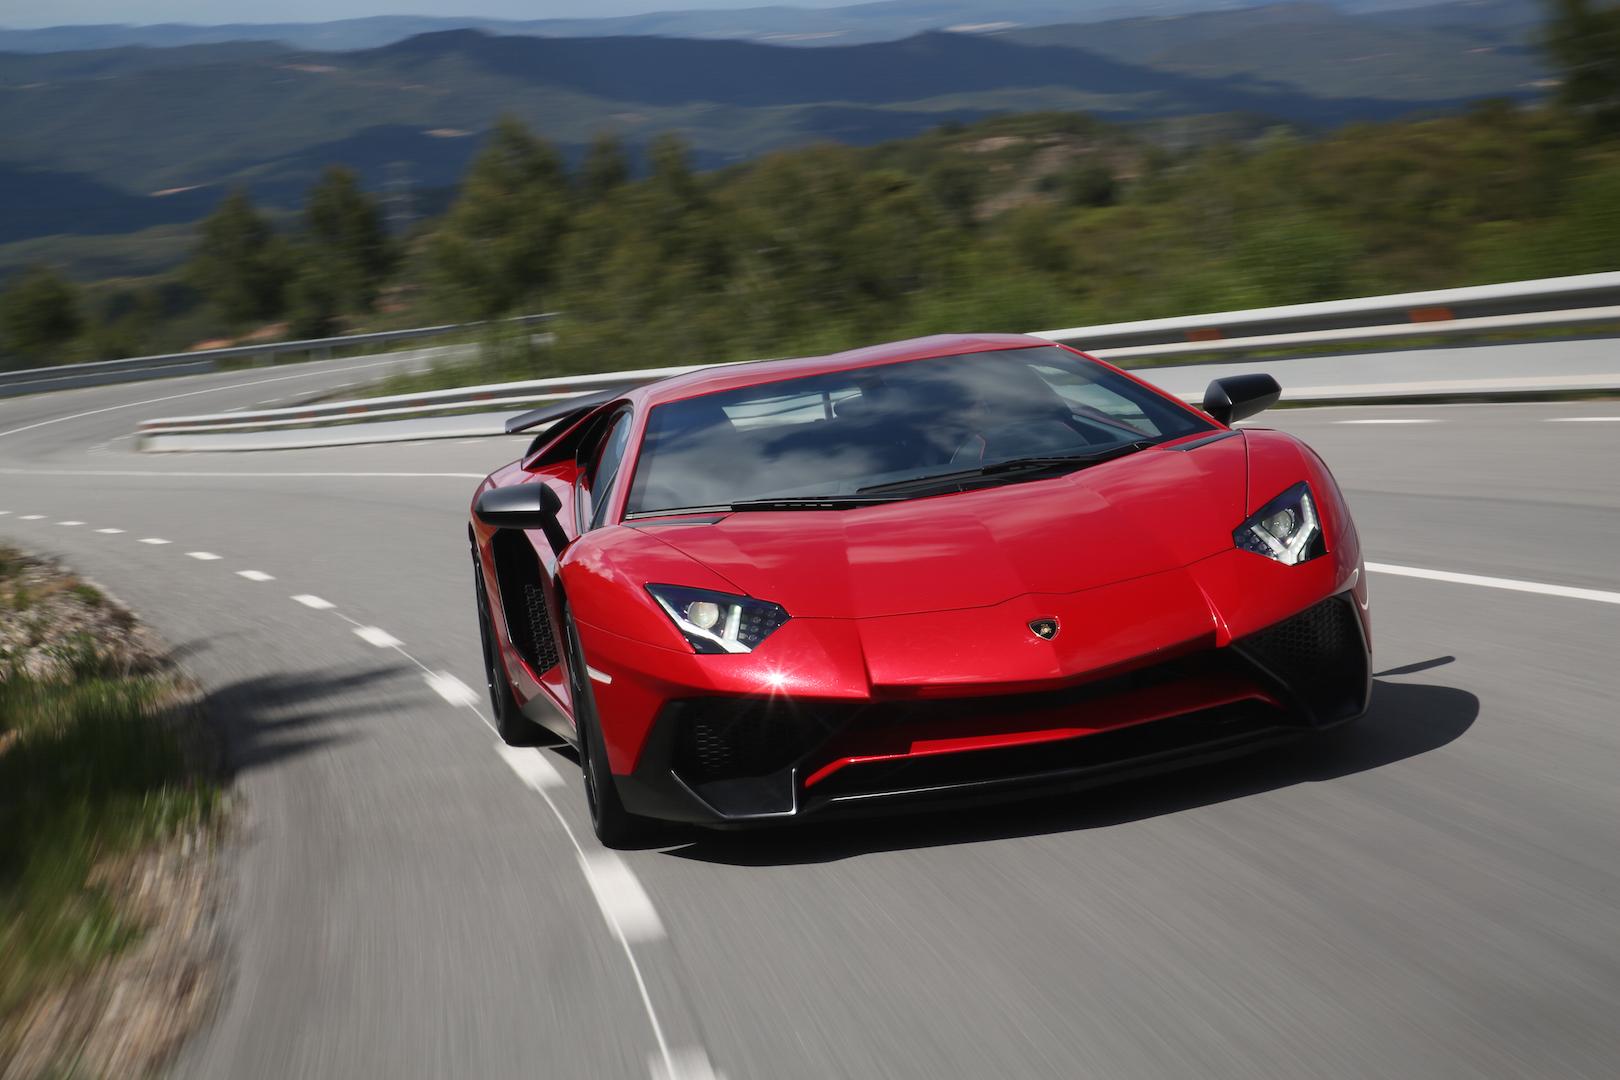 Motor Authority Best Car To Buy Nominee 2016 Lamborghini Aventador Sv